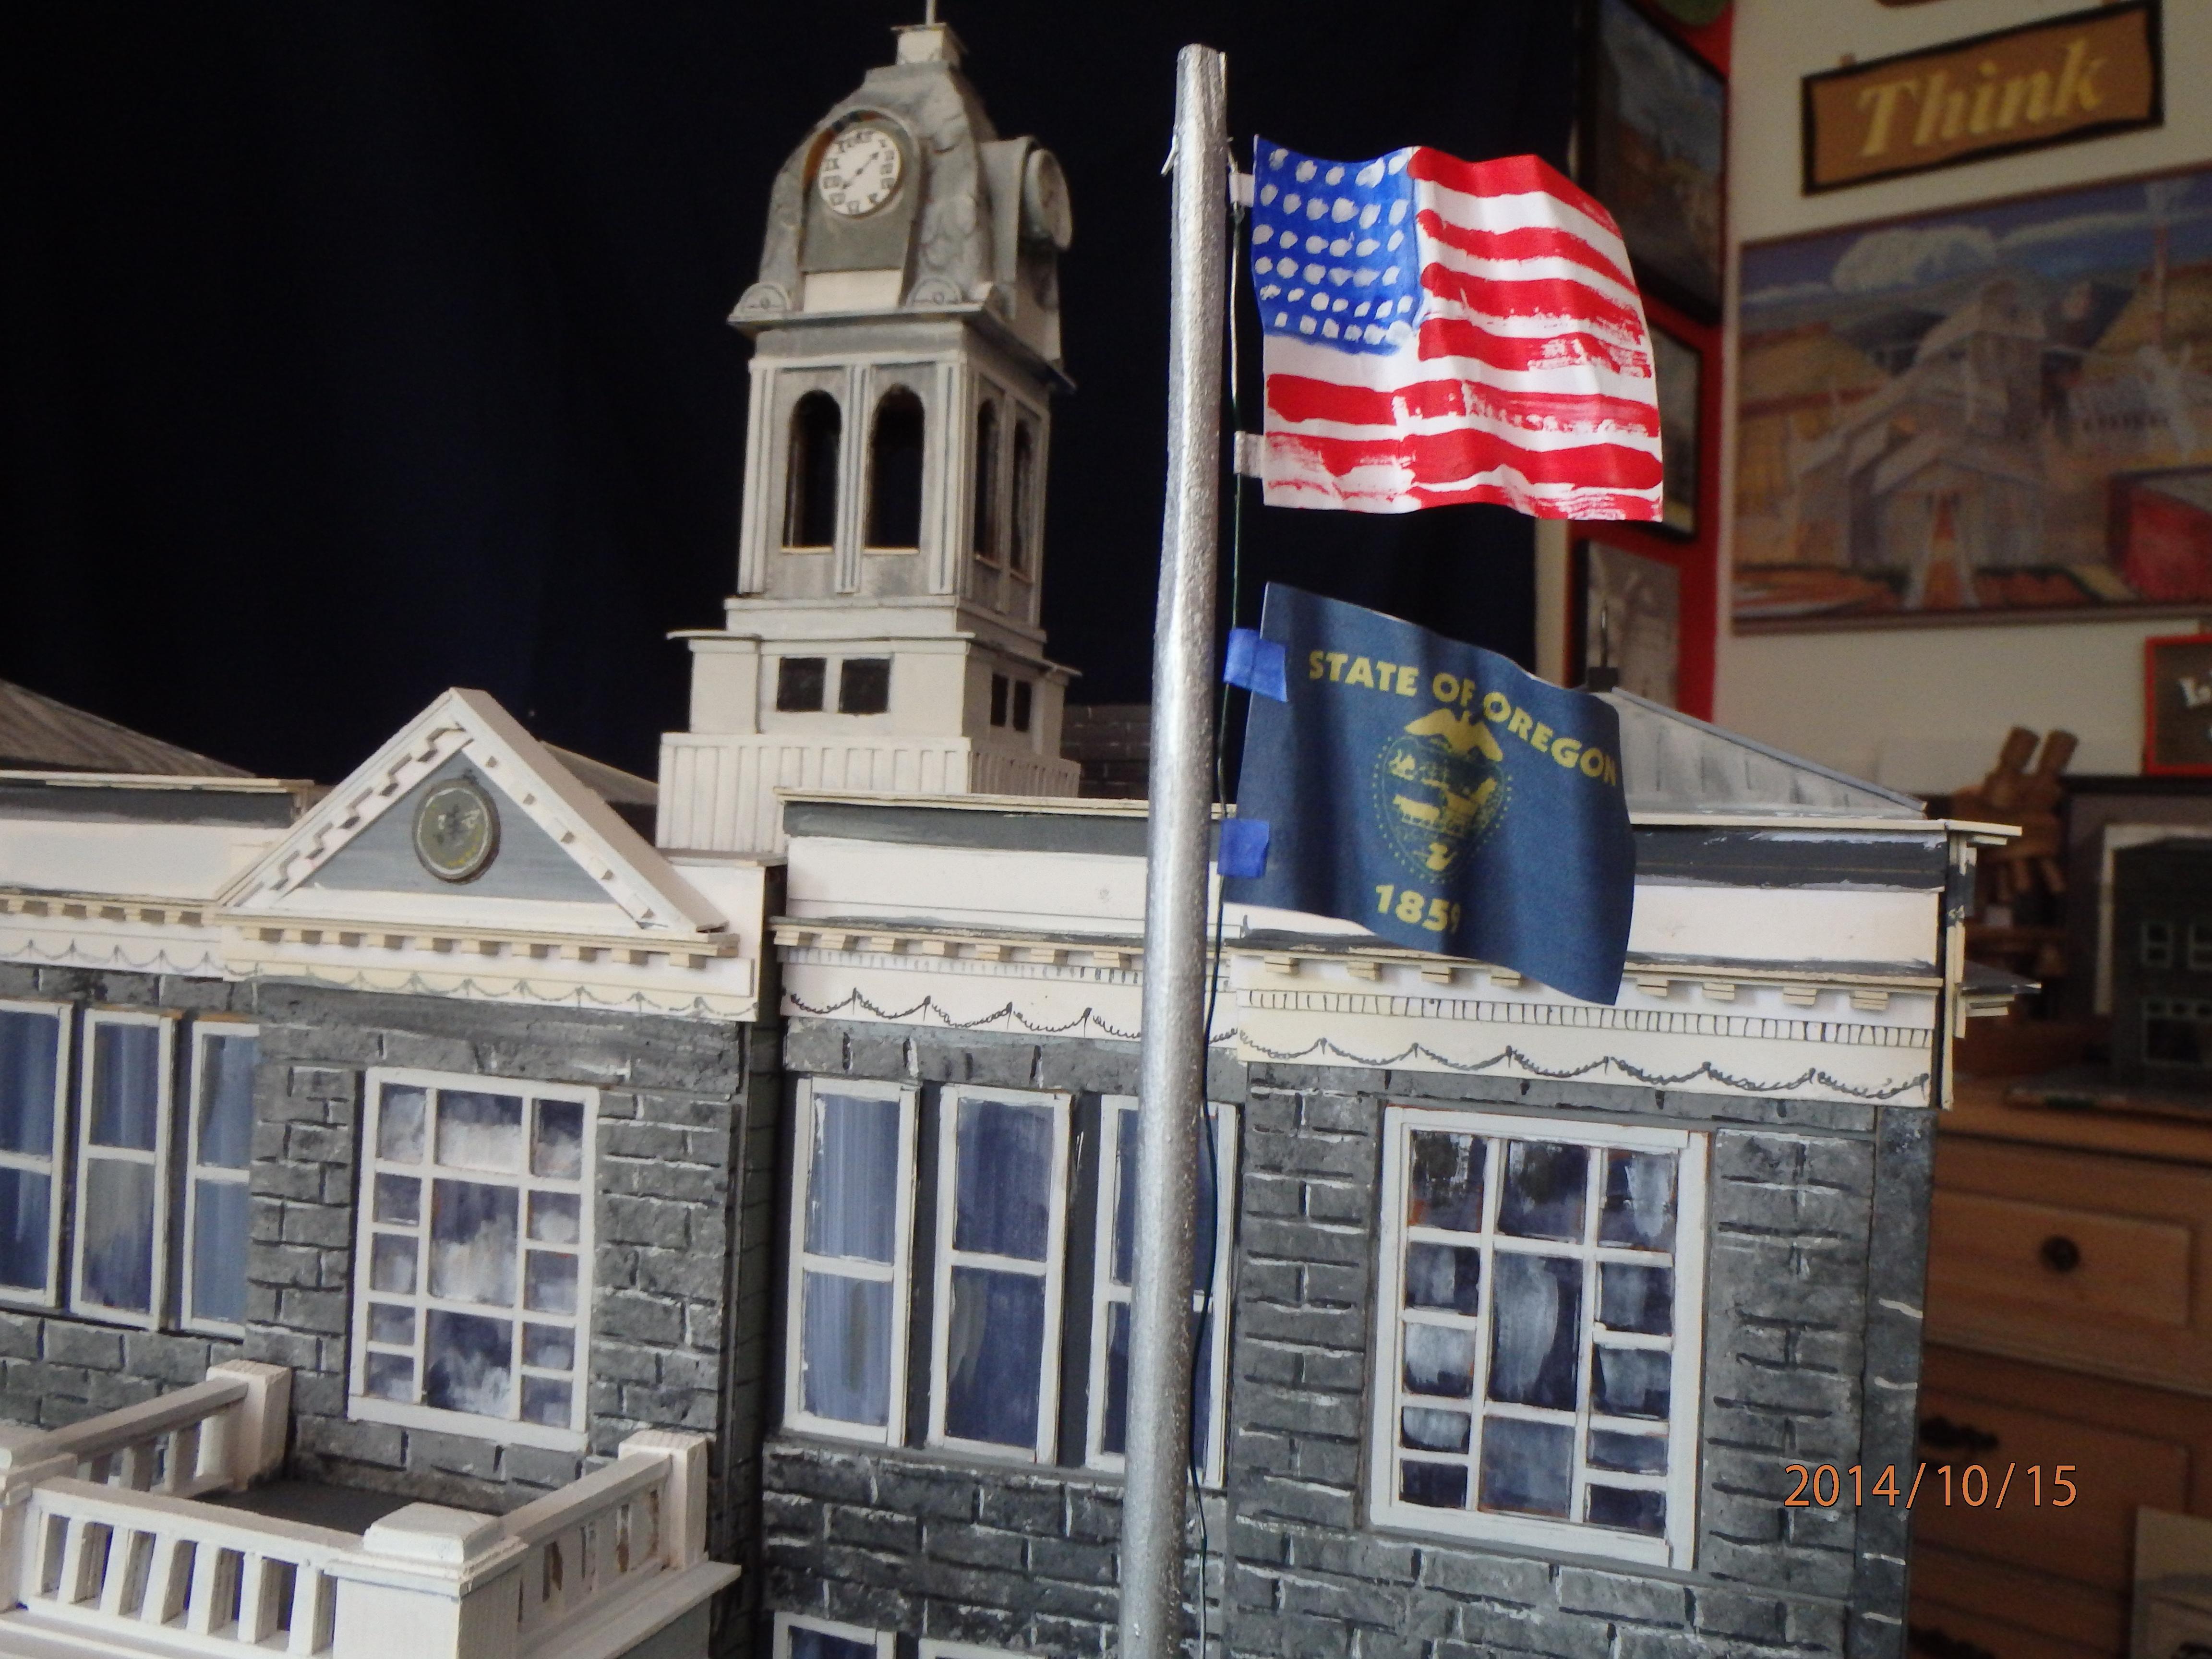 Picture of Chimney, Flagpoles, Columns, Etc